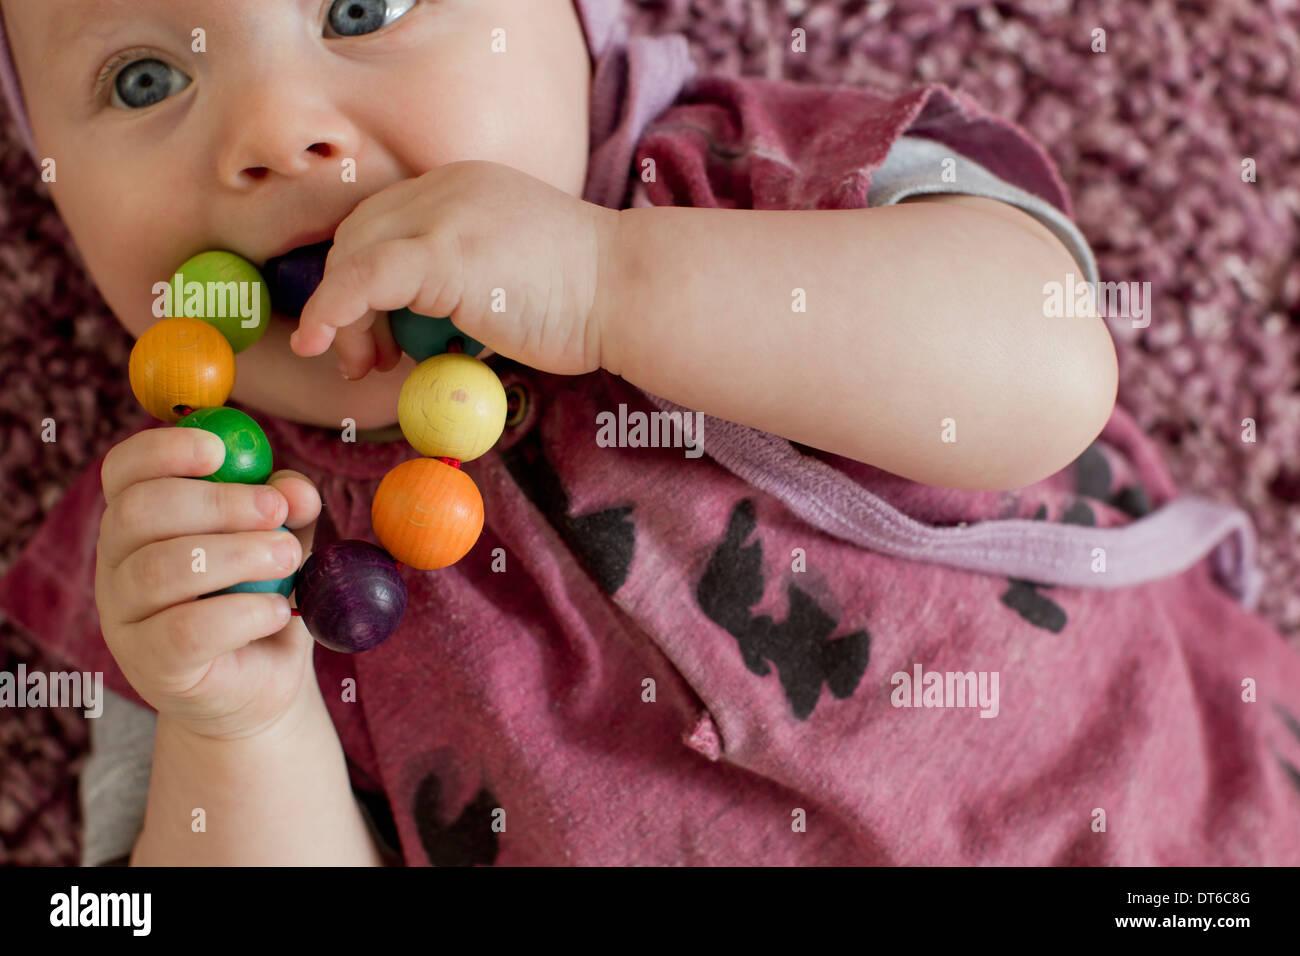 Babymädchen mit Kinderkrankheiten Spielzeug Stockbild